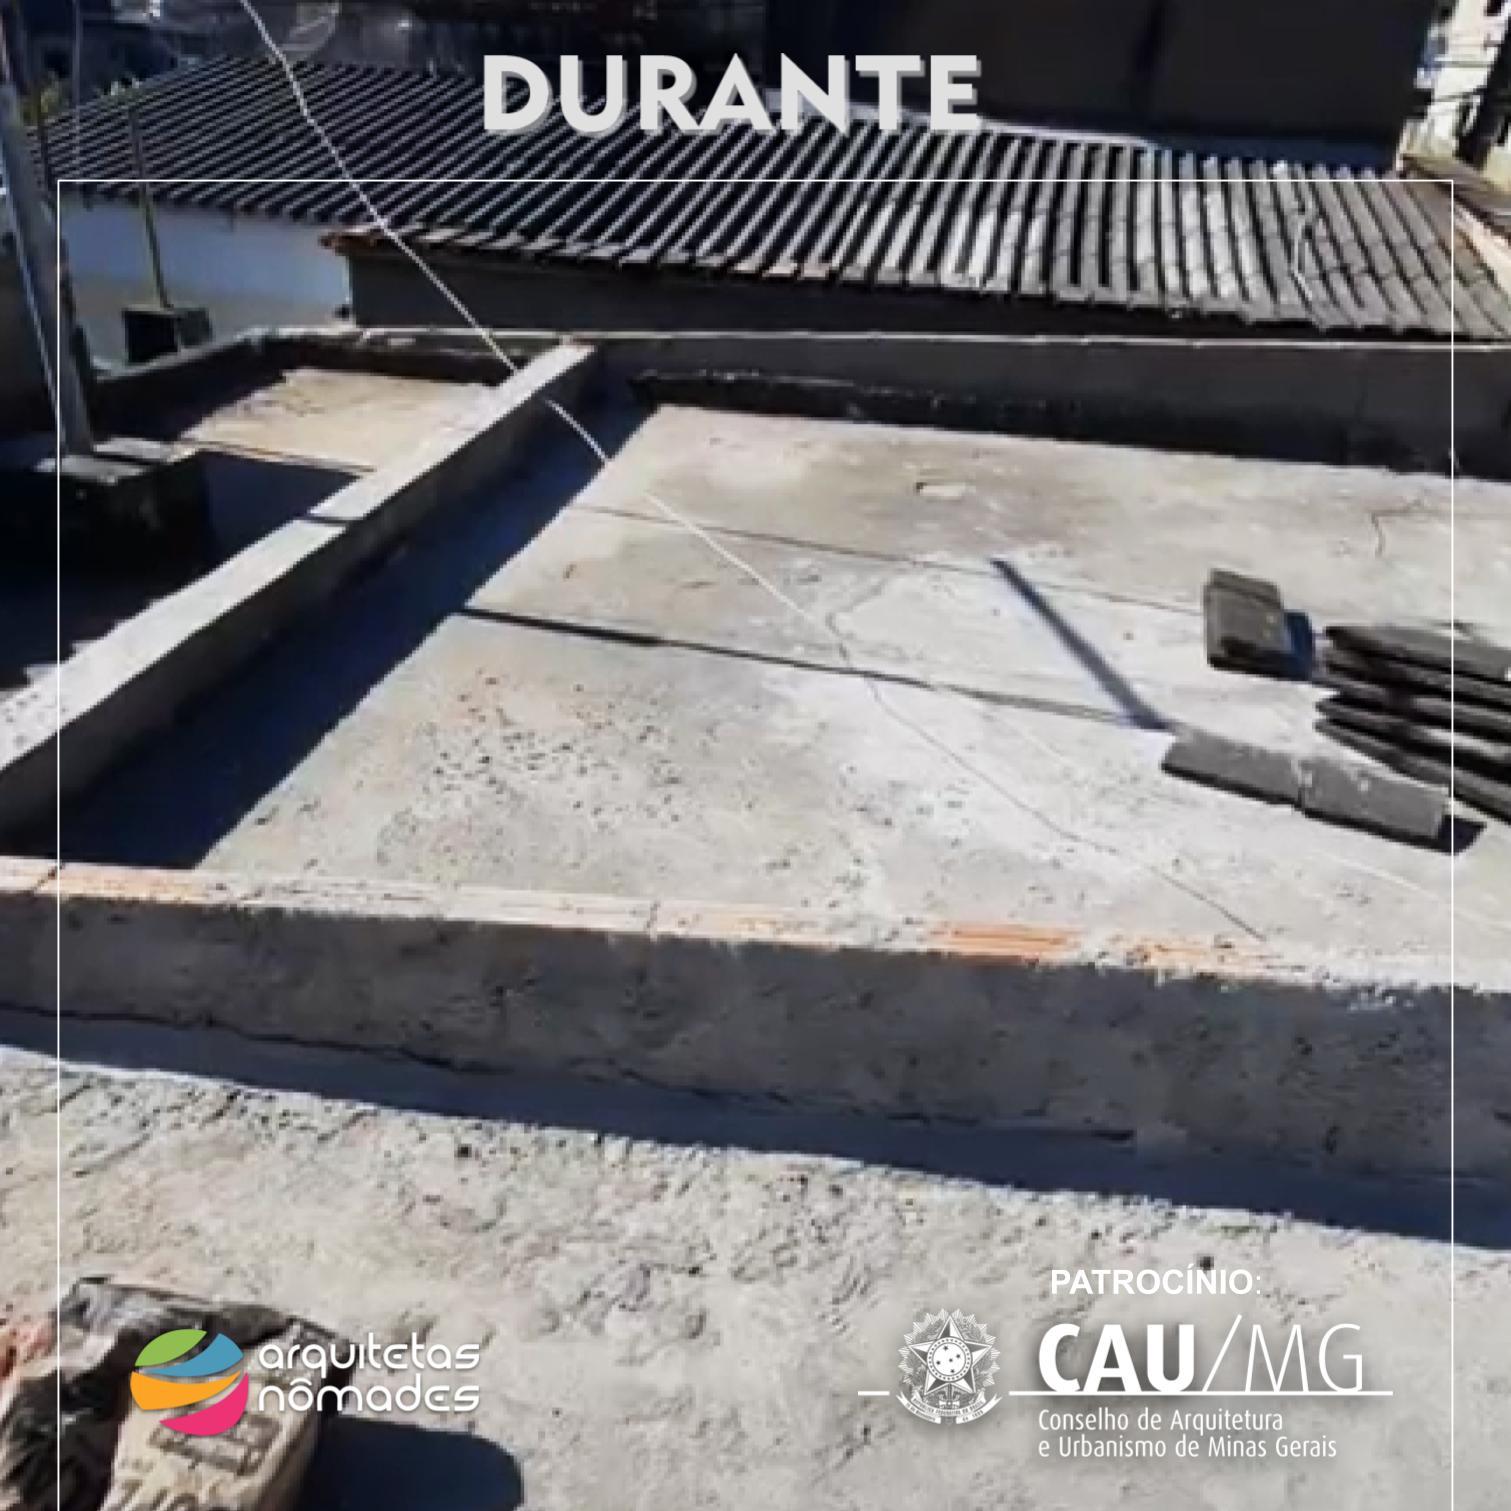 DURANTE1 – sandra